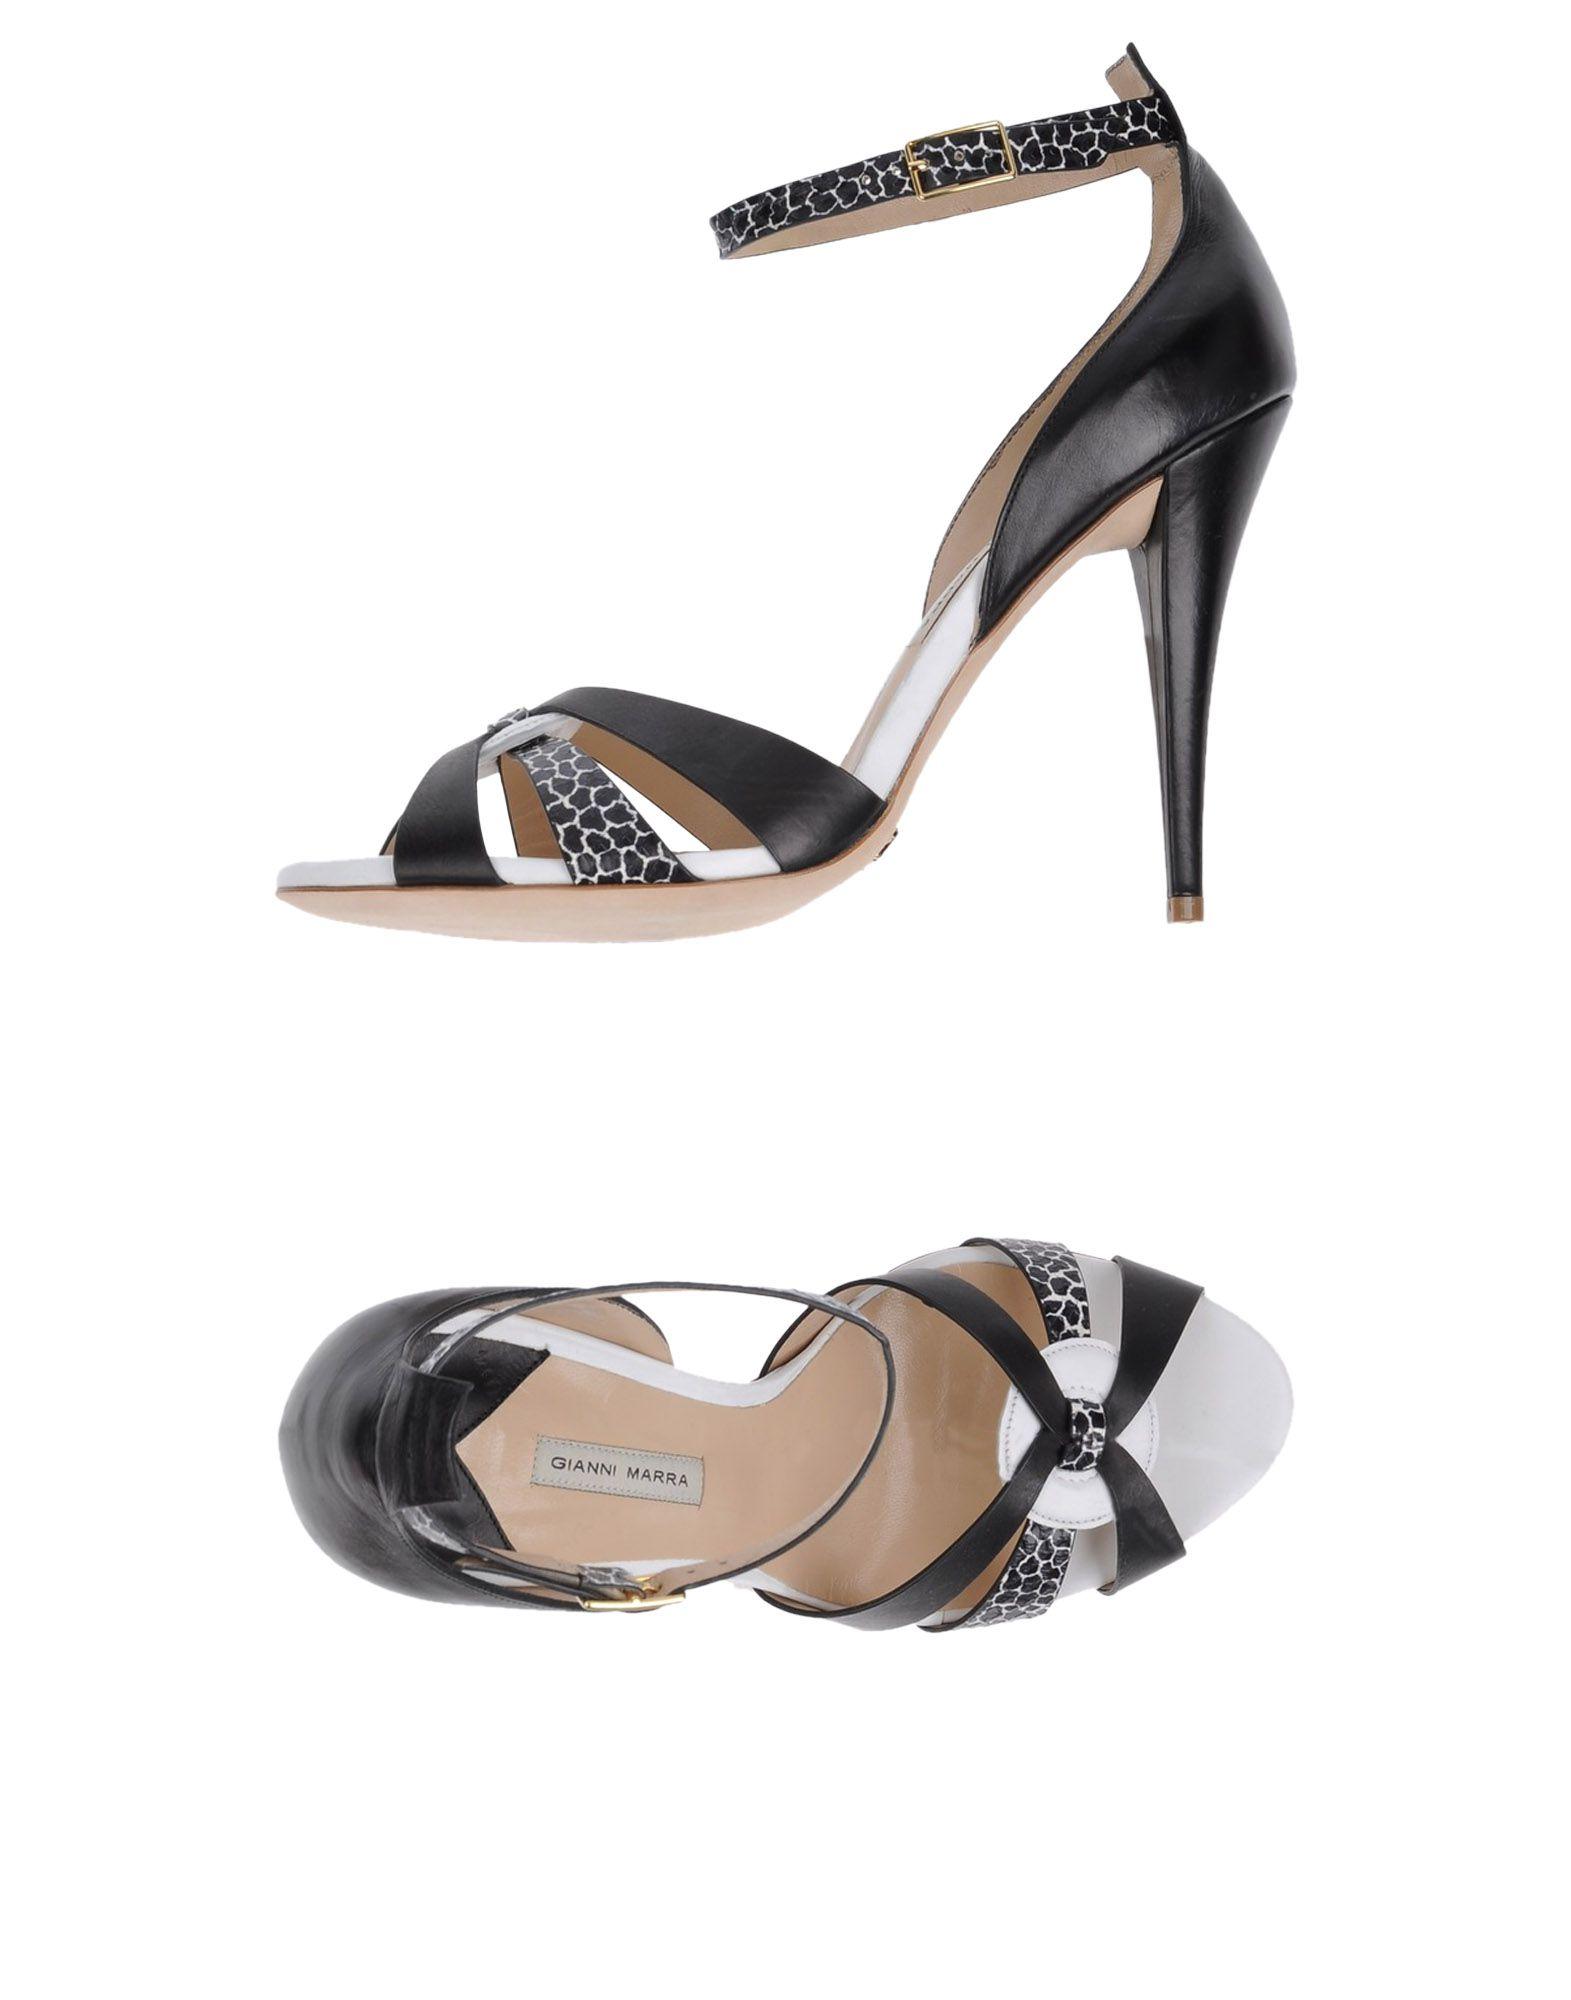 Gianni Marra Sandalen Damen  11236401AR Gute Qualität beliebte Schuhe